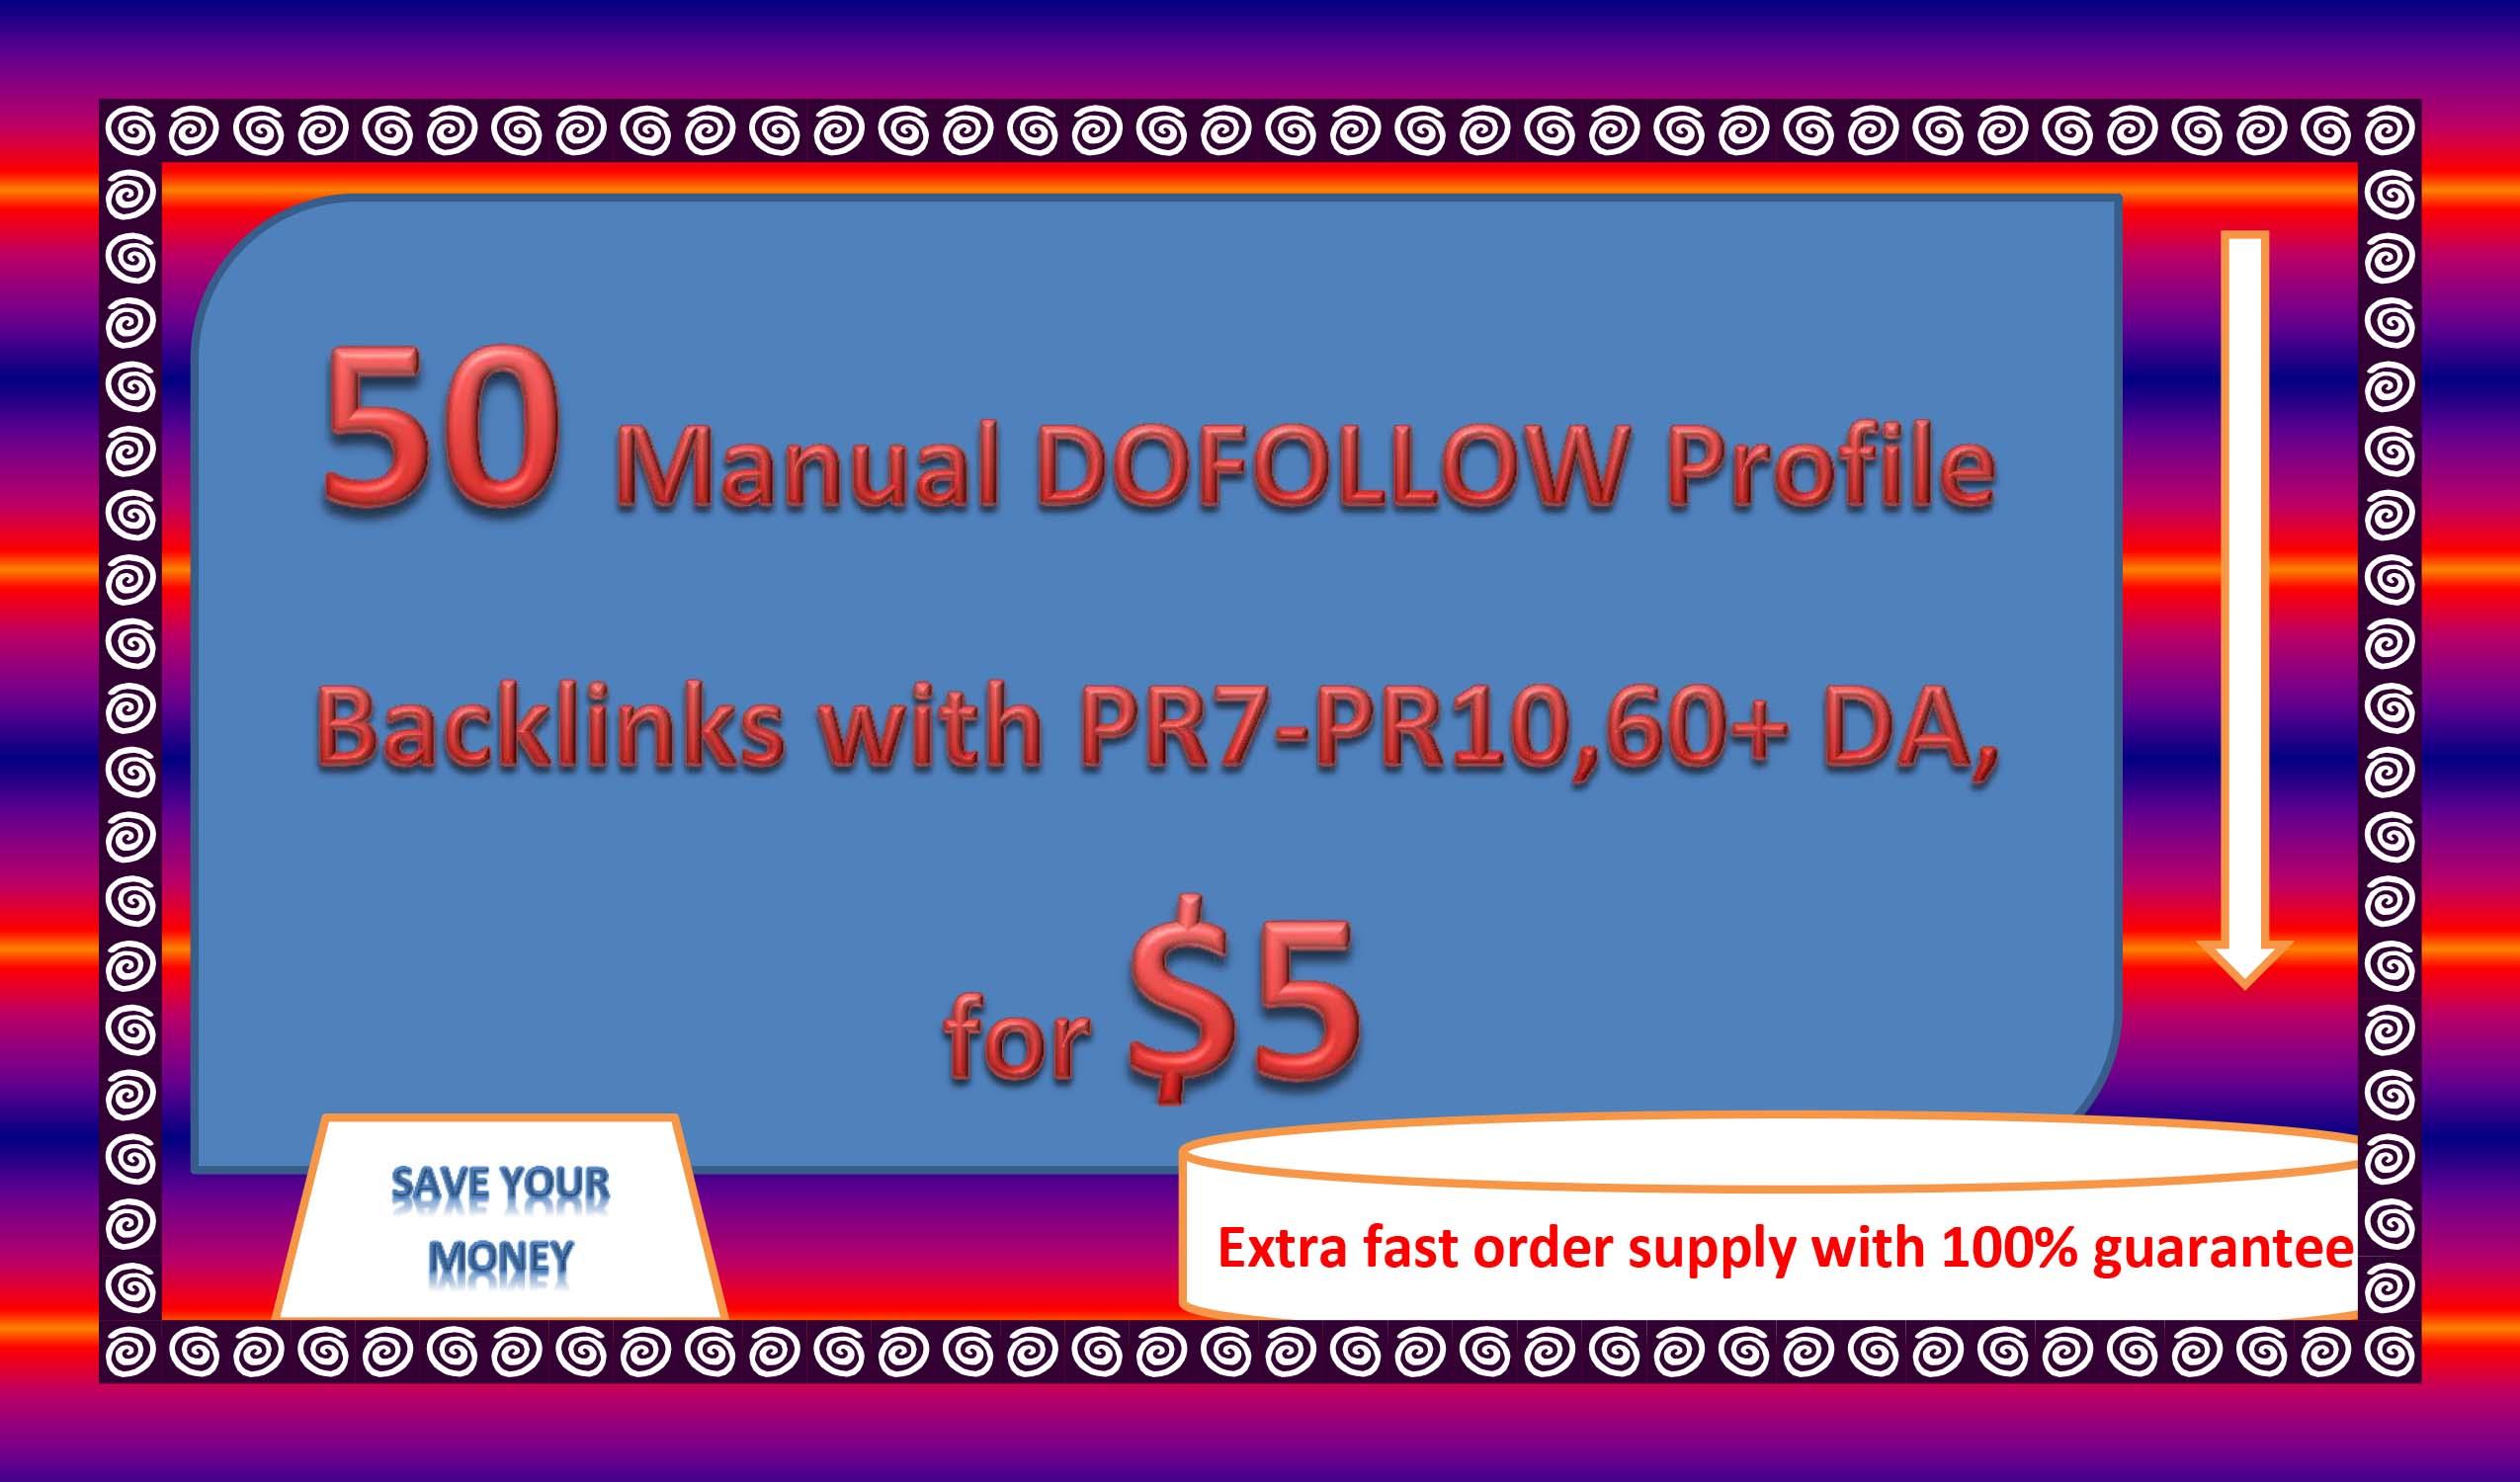 50 Manual DOFOLLOW Profile Backlinks with PR7-PR10, 60+ DA